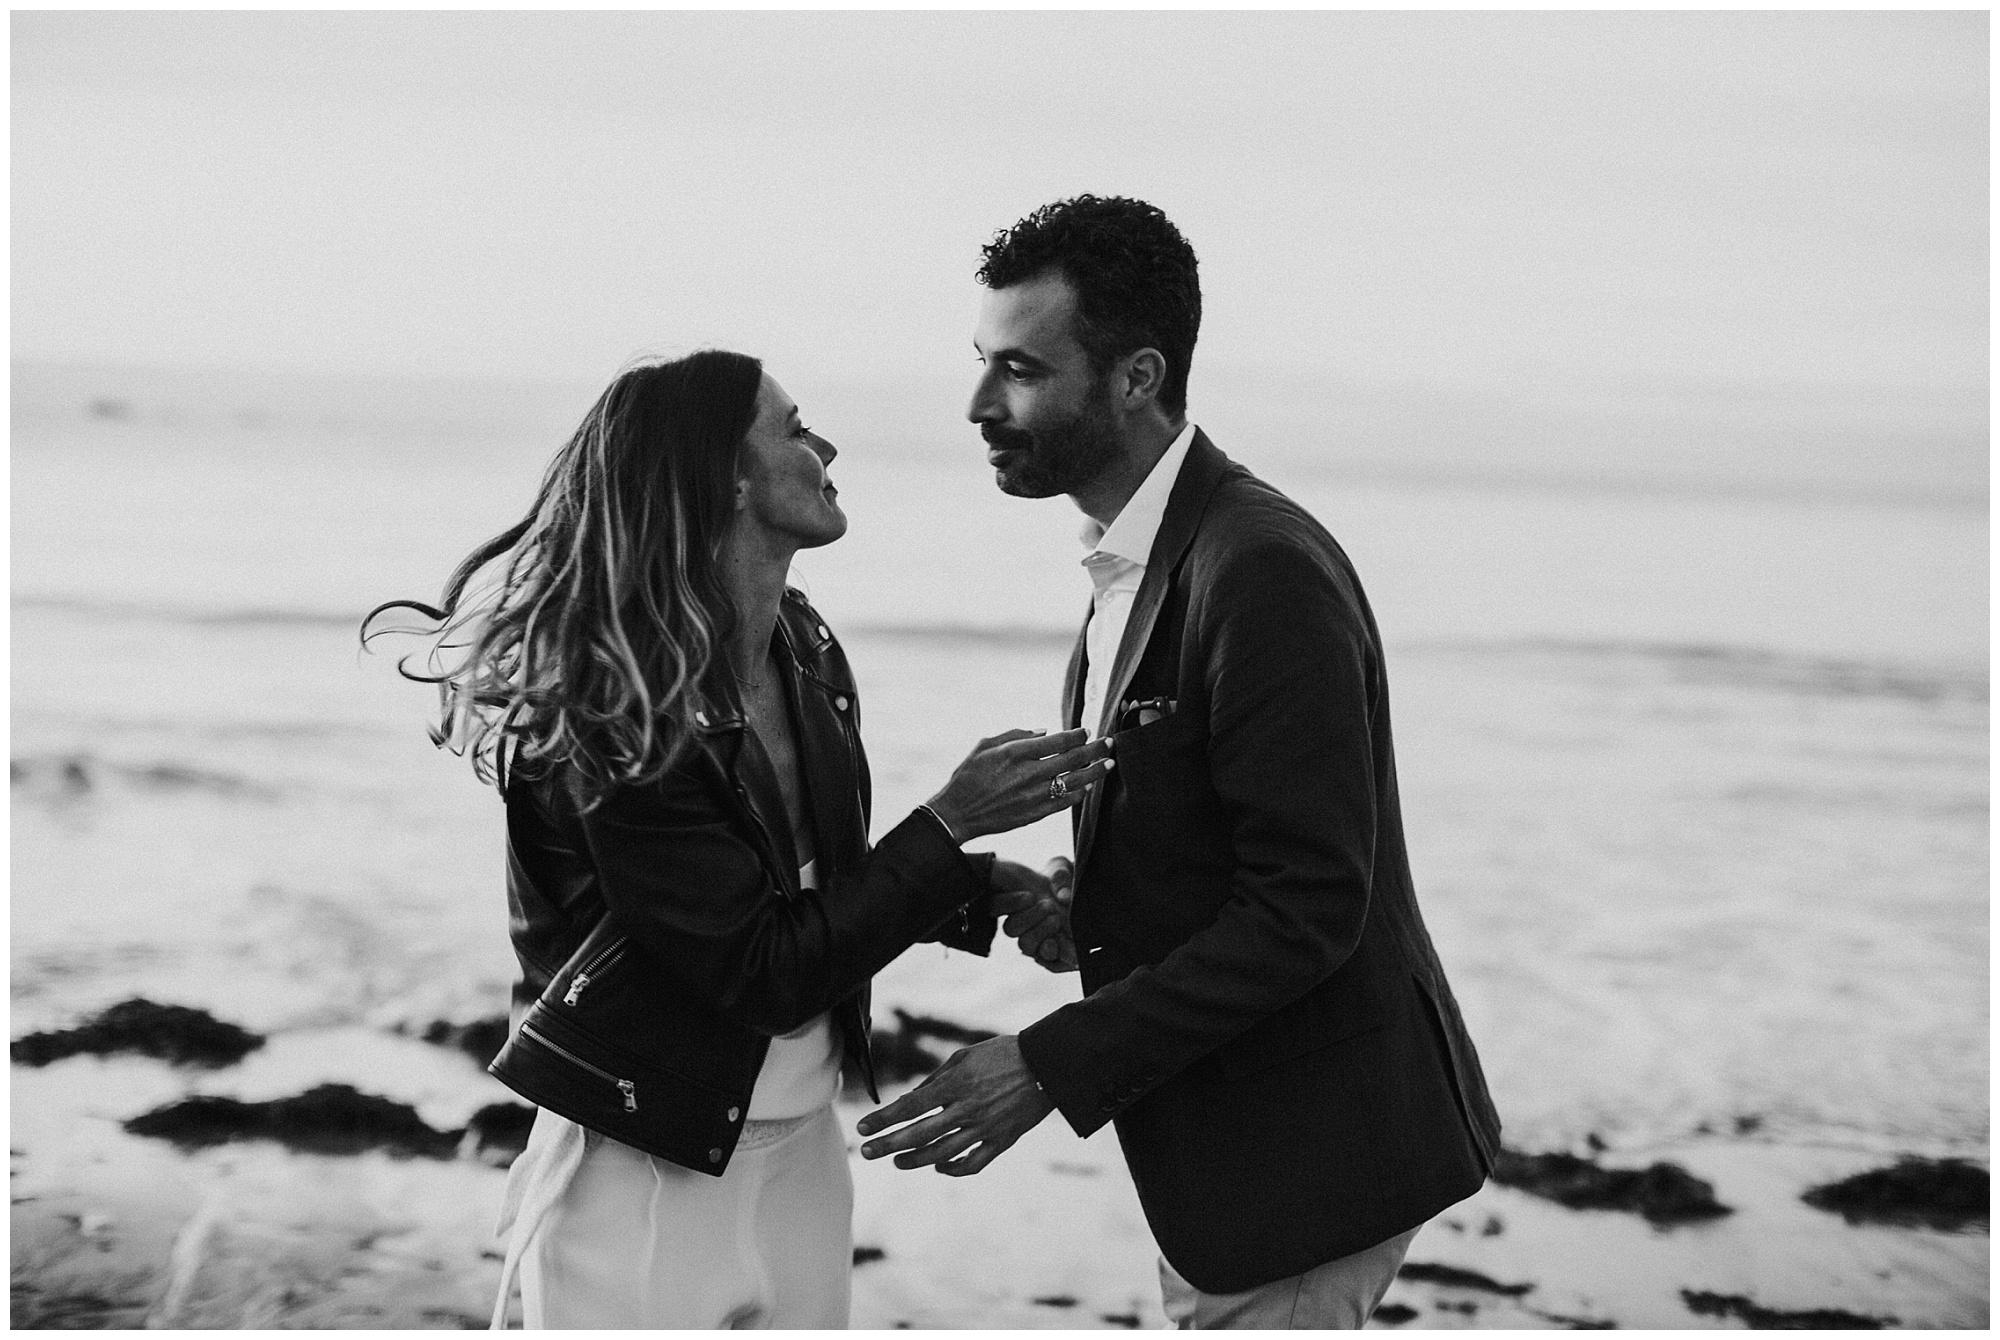 Kateryna-photos-photographe-mariage-bretagne-saint-malo-finistere-cotes-darmor-wedding_0089.jpg